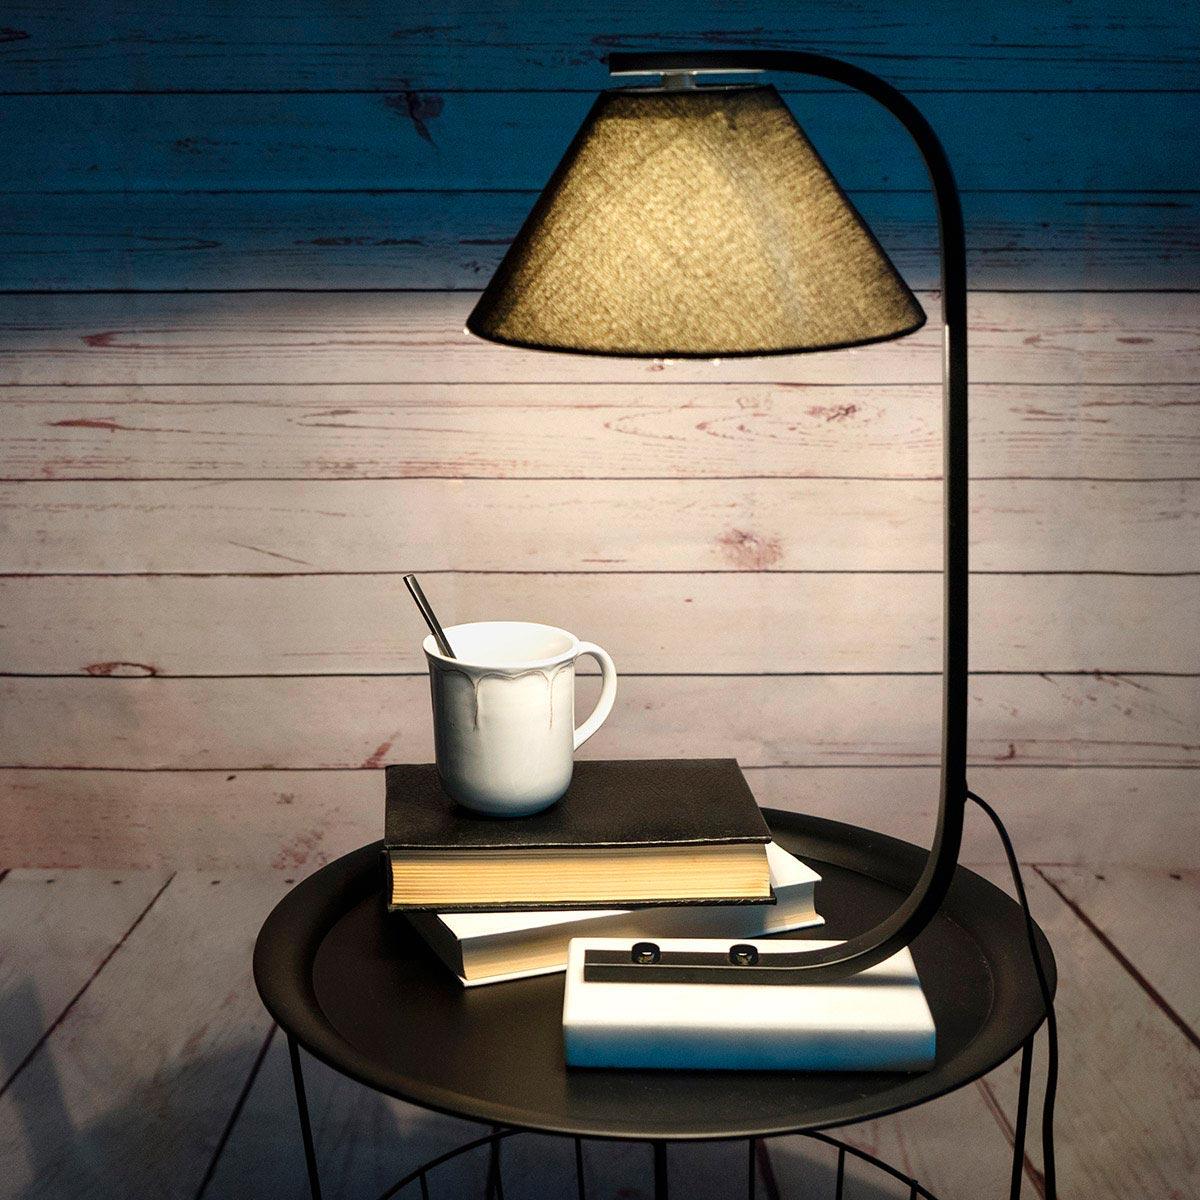 Table lamp Mr Jones marble, color black White, retro air, 50x23x25 cm